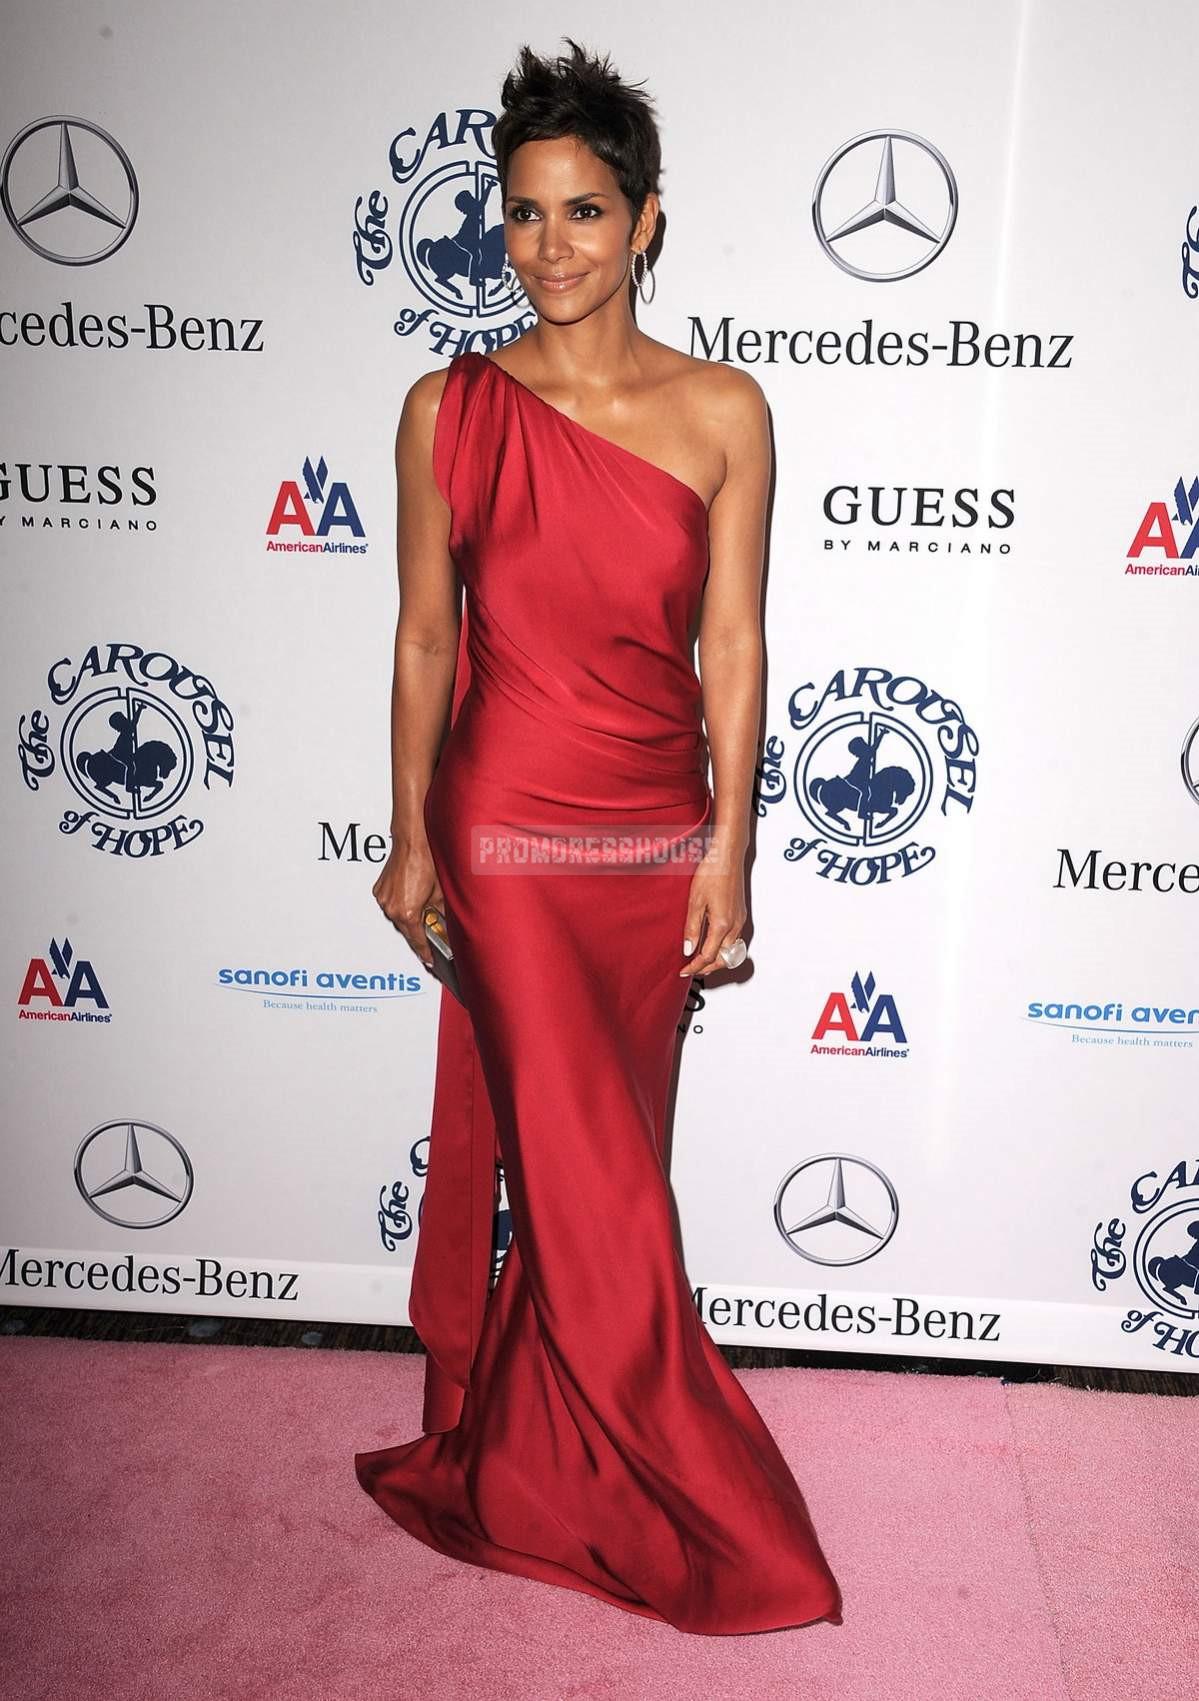 Satin Ruffles Ruby Sweep Train One Shoulder Column Celebrity Dress - Promdresshouse.com